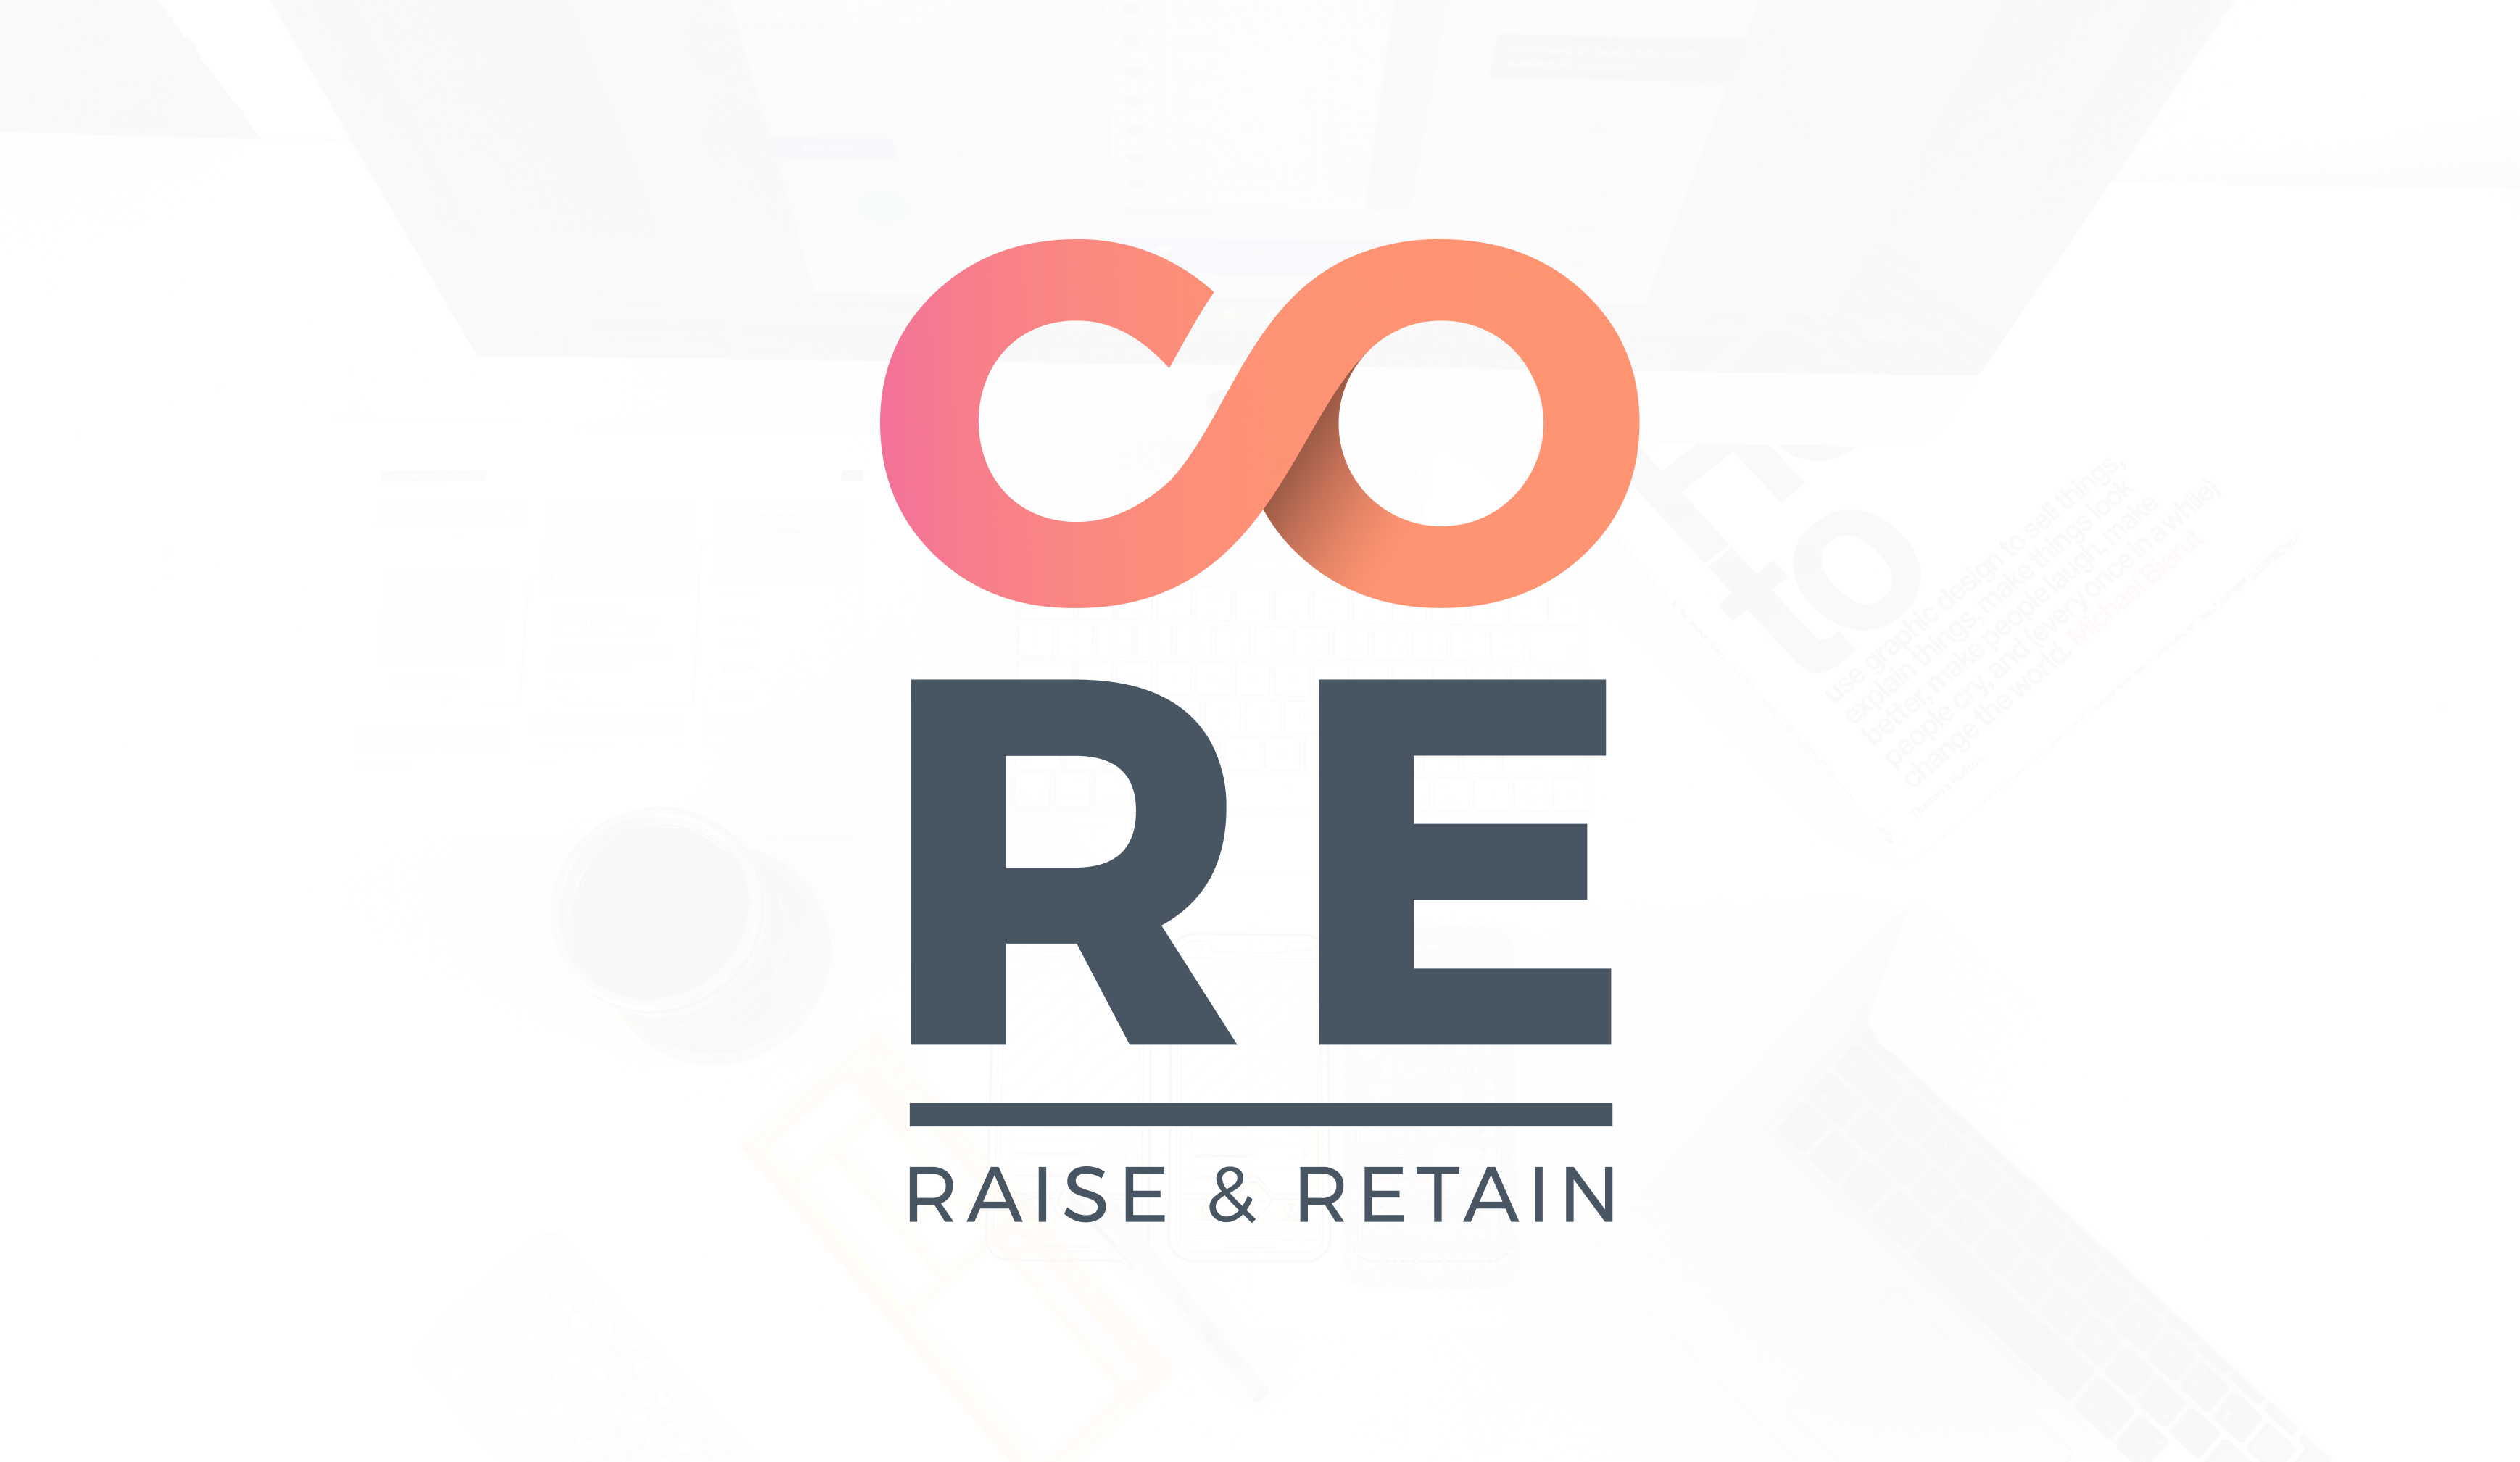 CORE - Raise & Retain logo